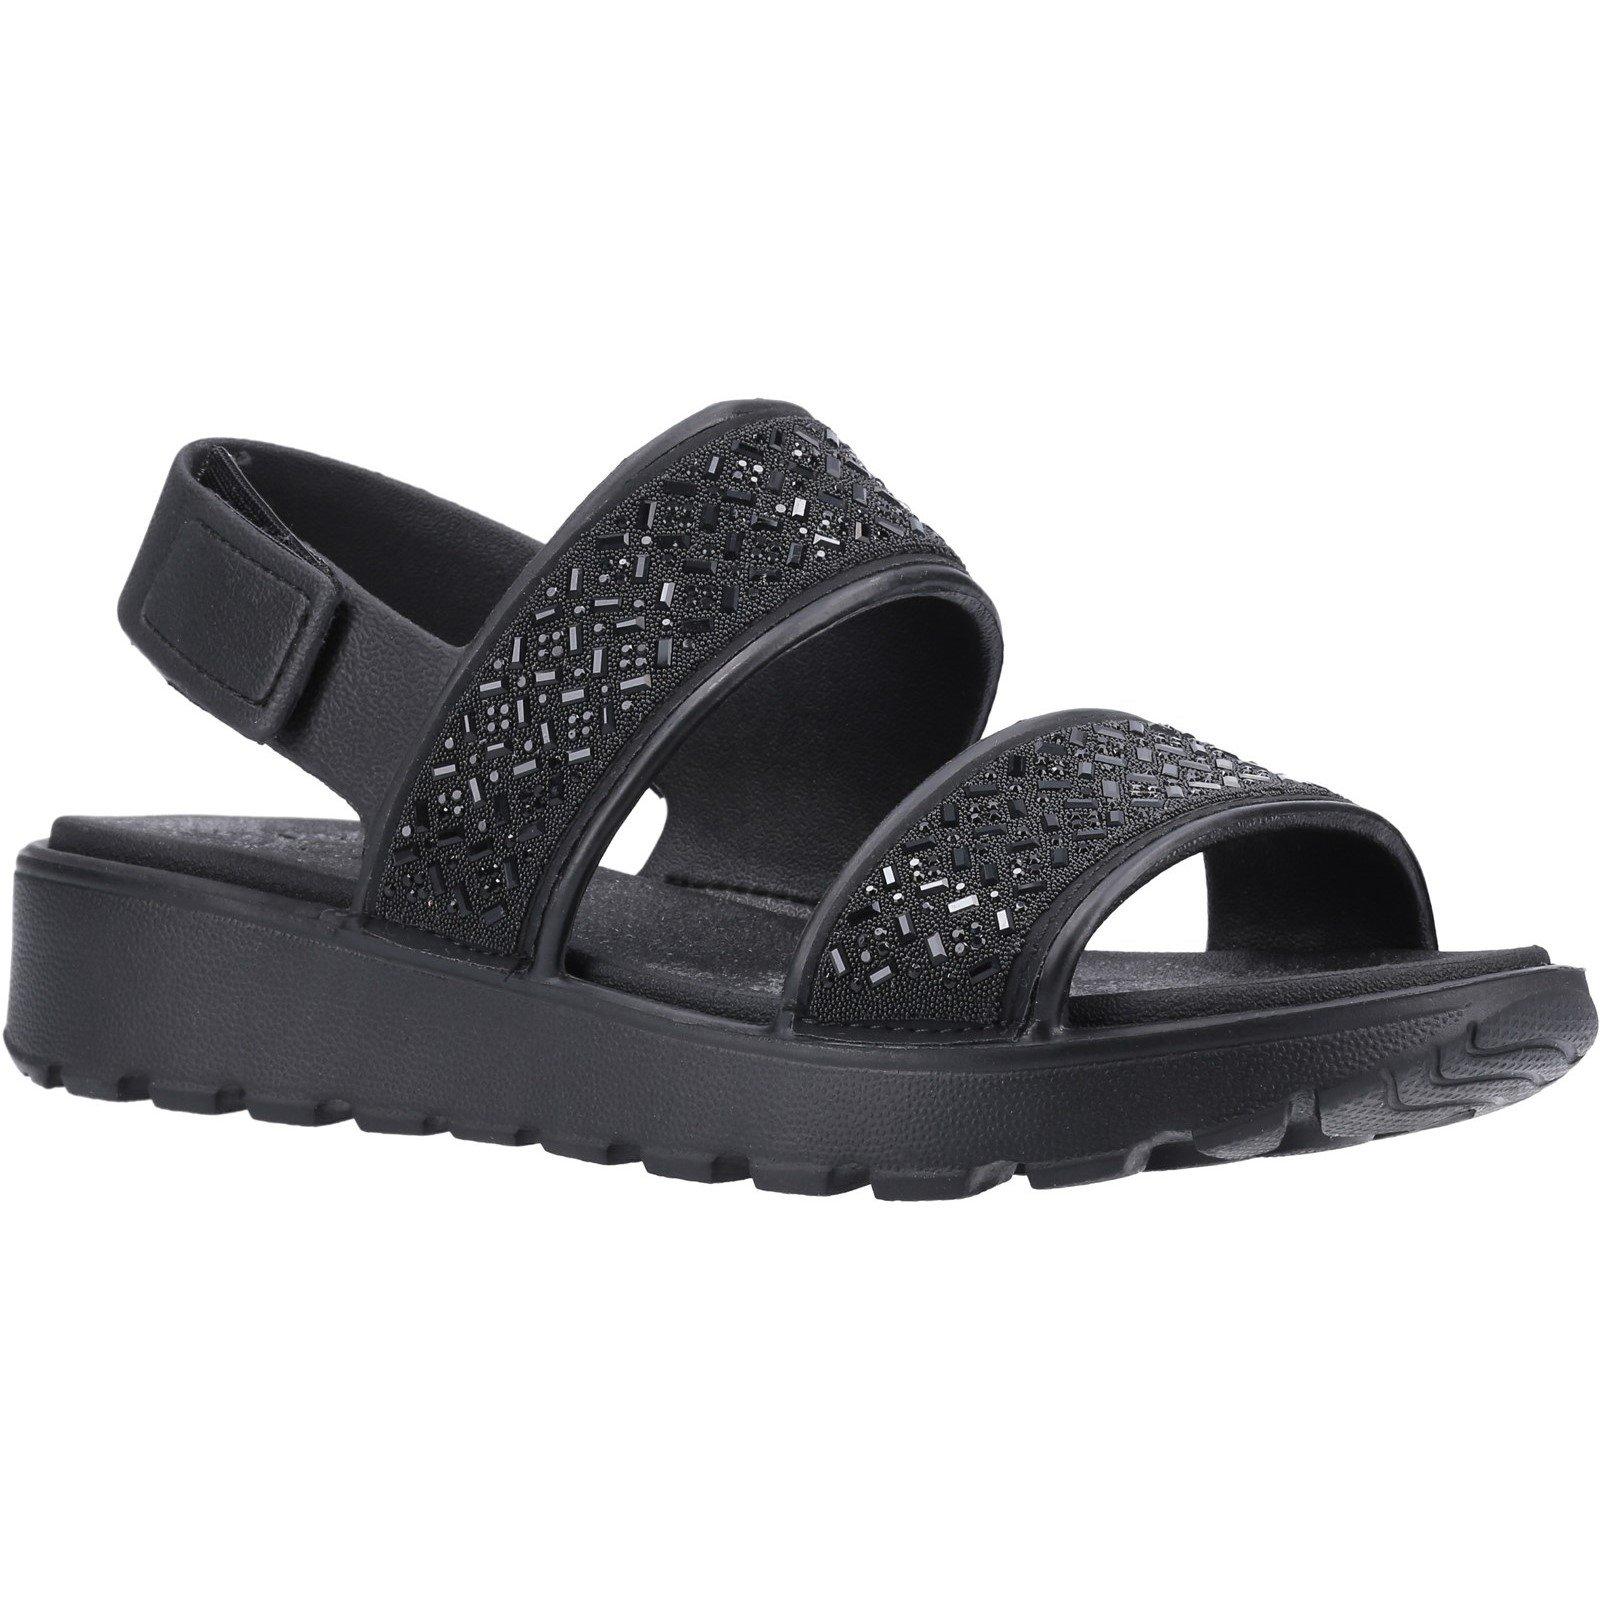 Skechers Women's Footsteps Glam Party Sandal Black 32369 - Black 2